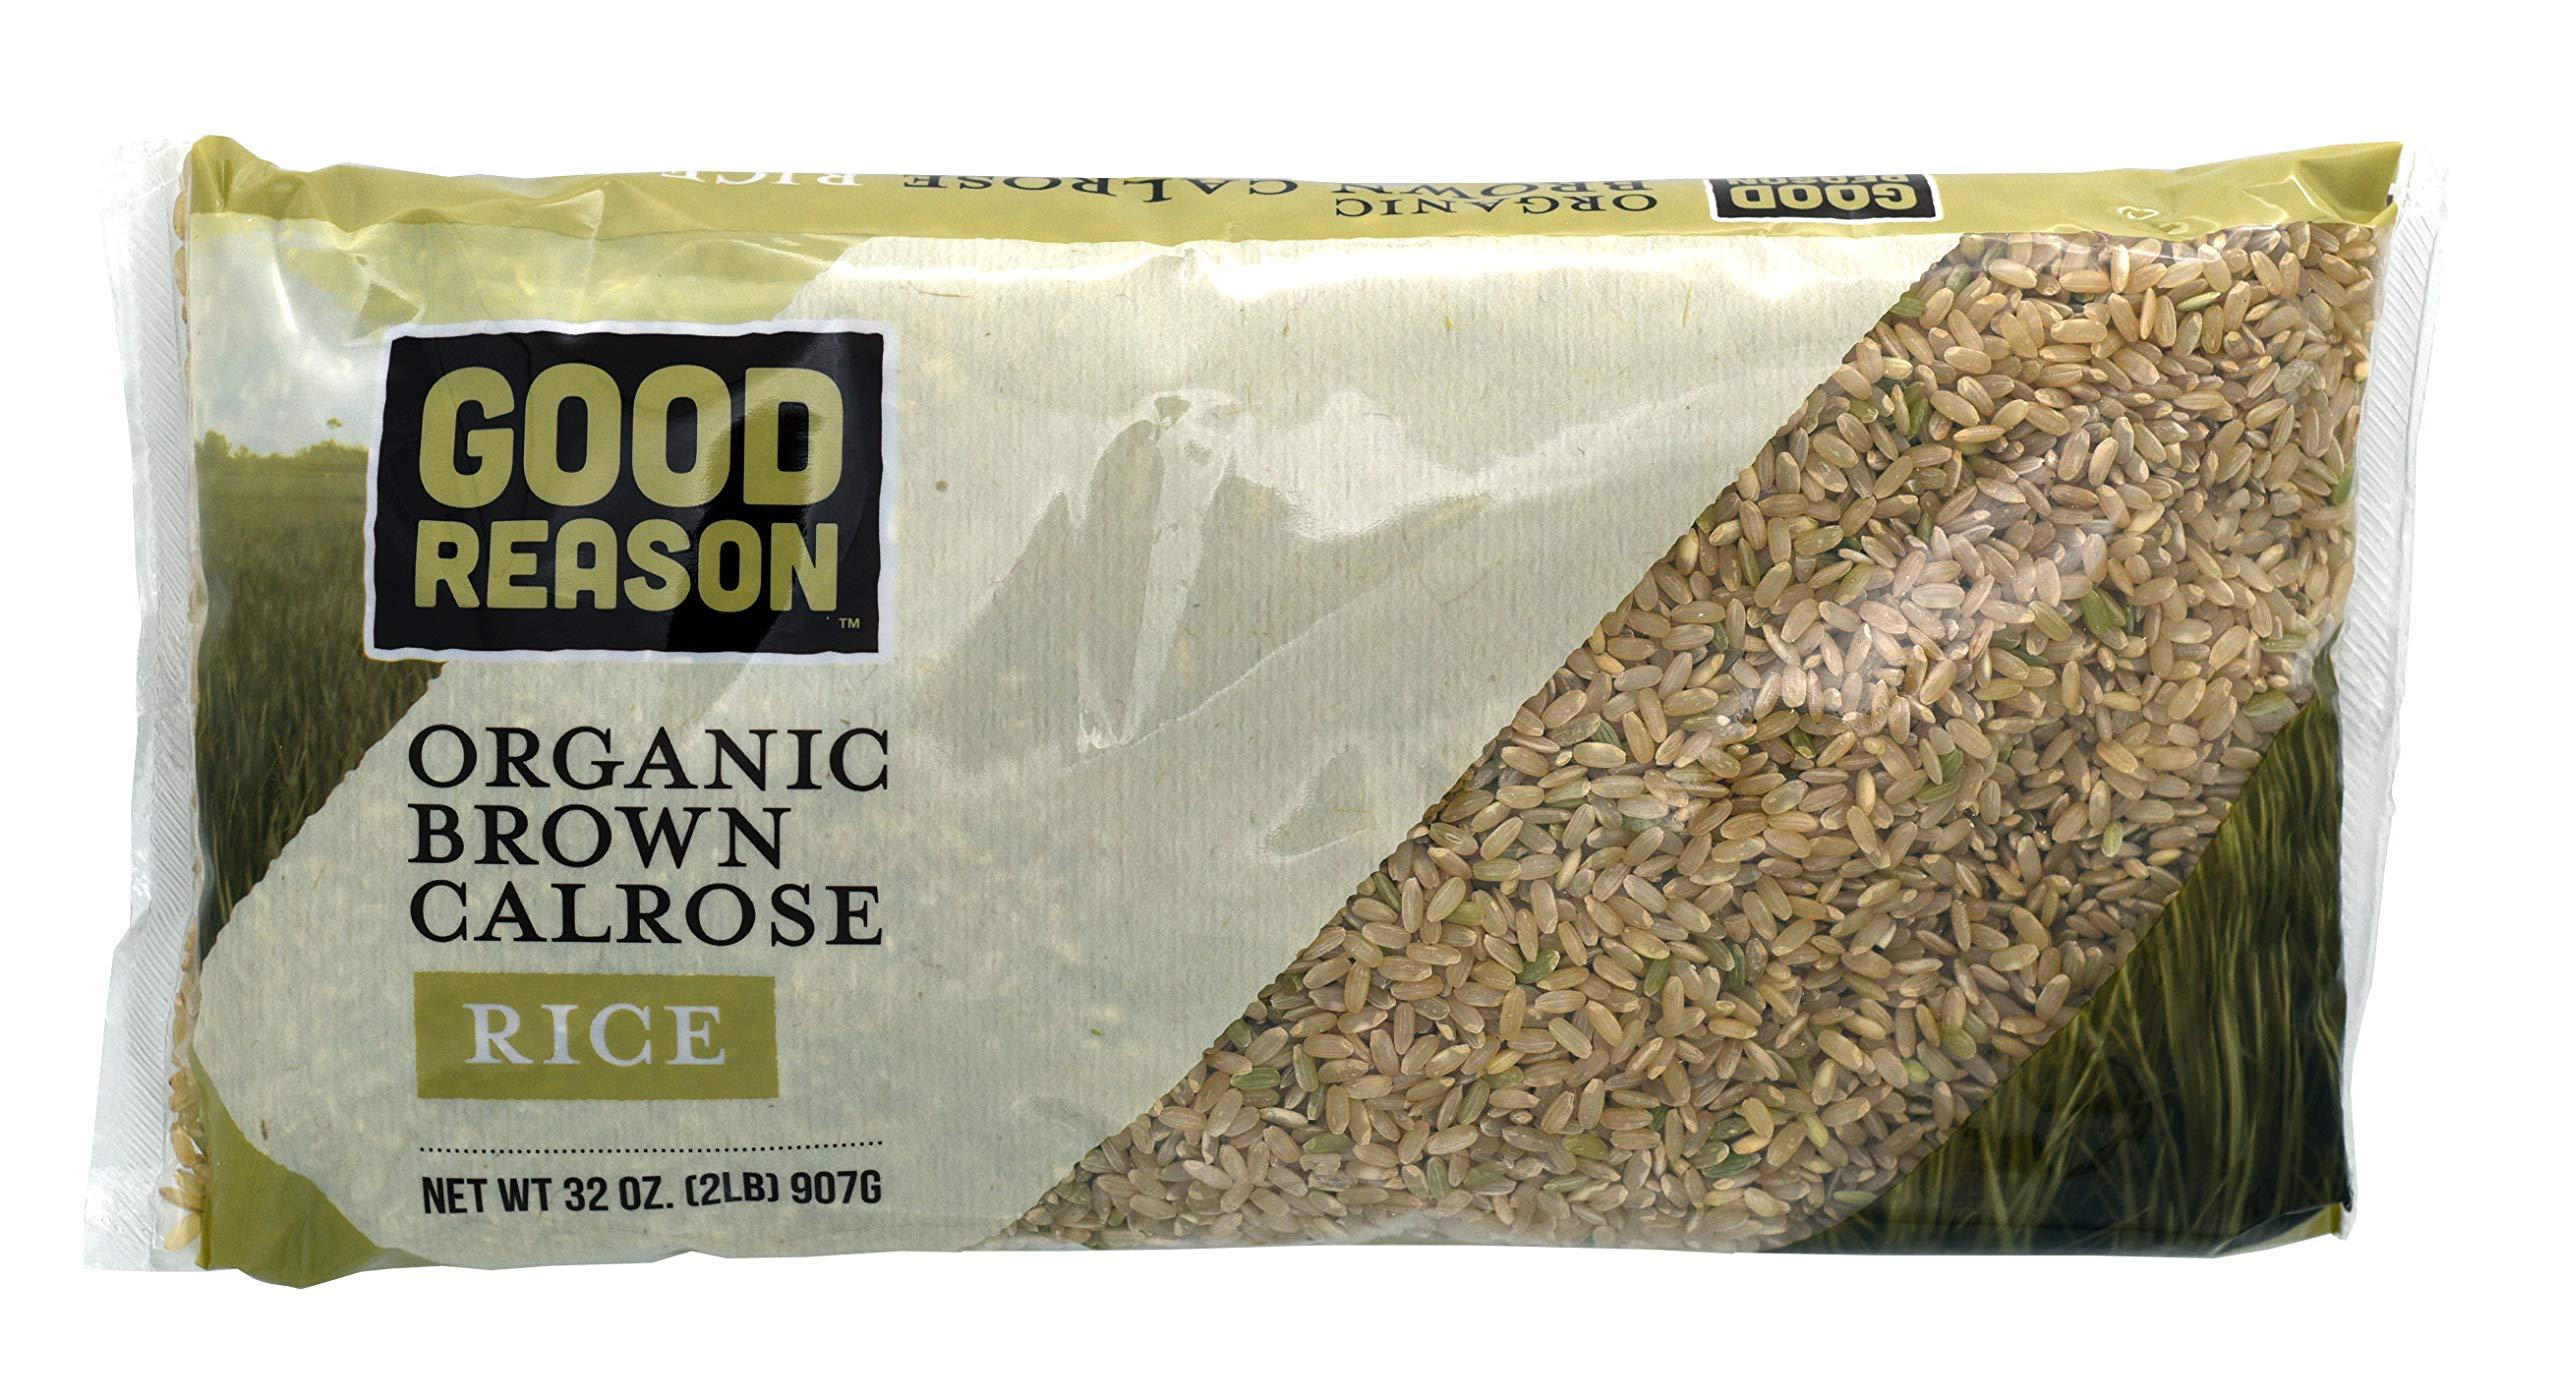 Good Reason Rice Organic Brown Calrose Rice, 2 Lb